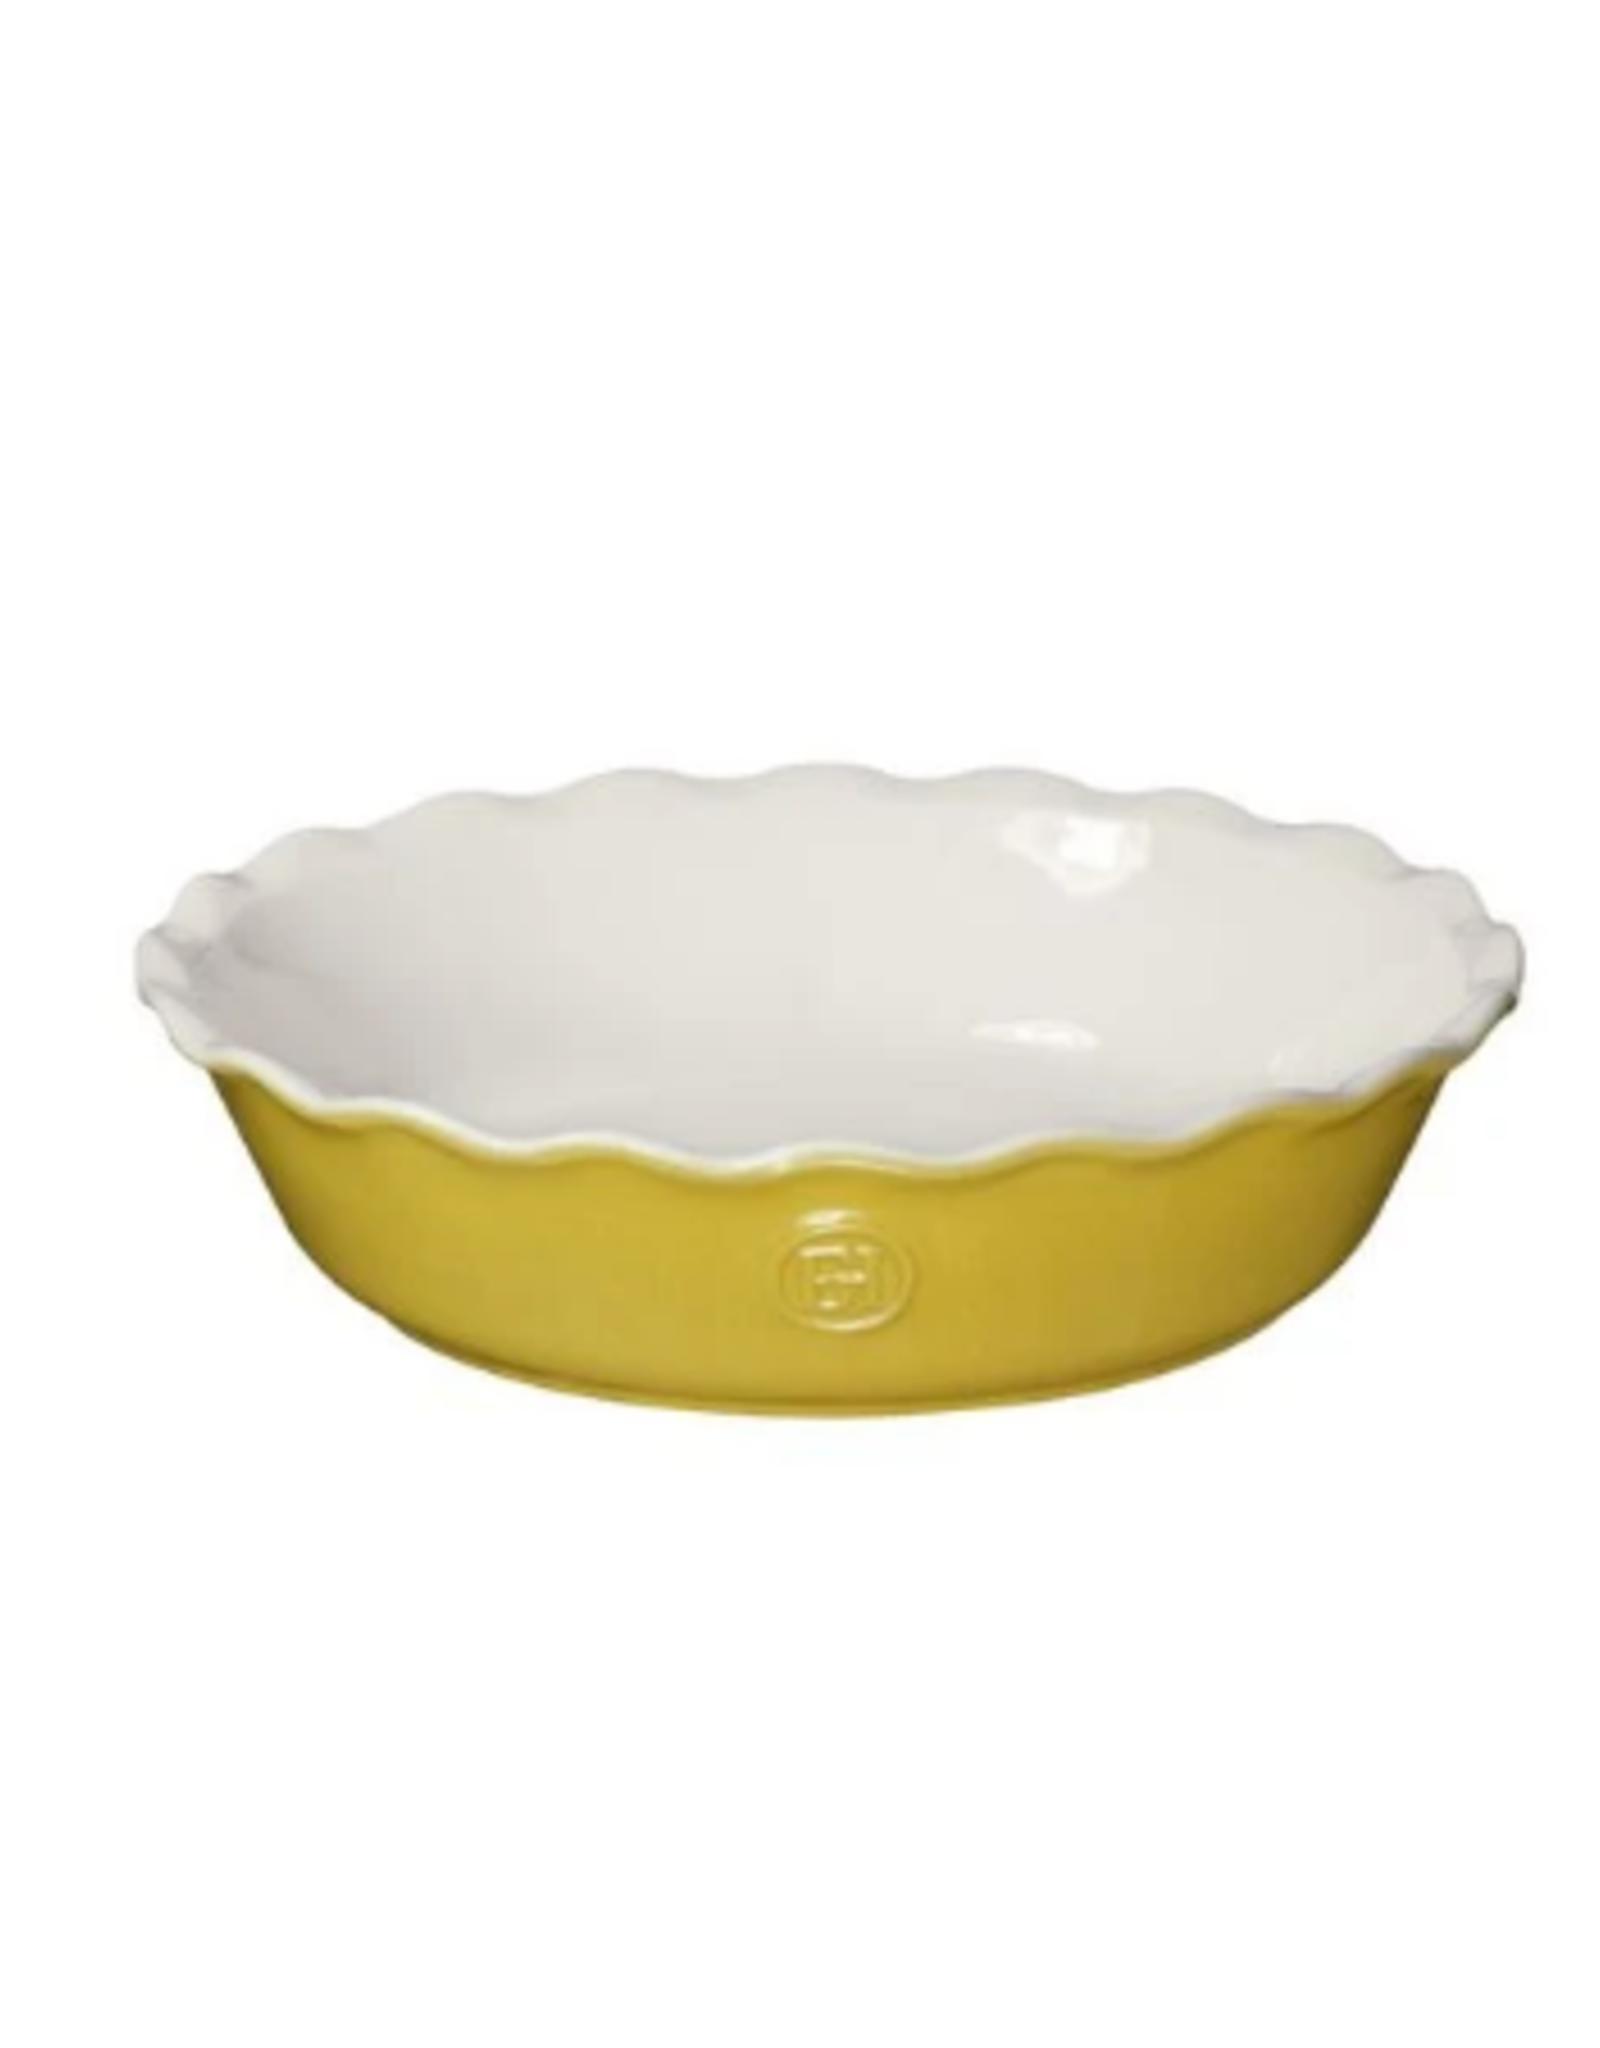 "Emile Henry Emile Henry Pie Dish, 9"", leaves"